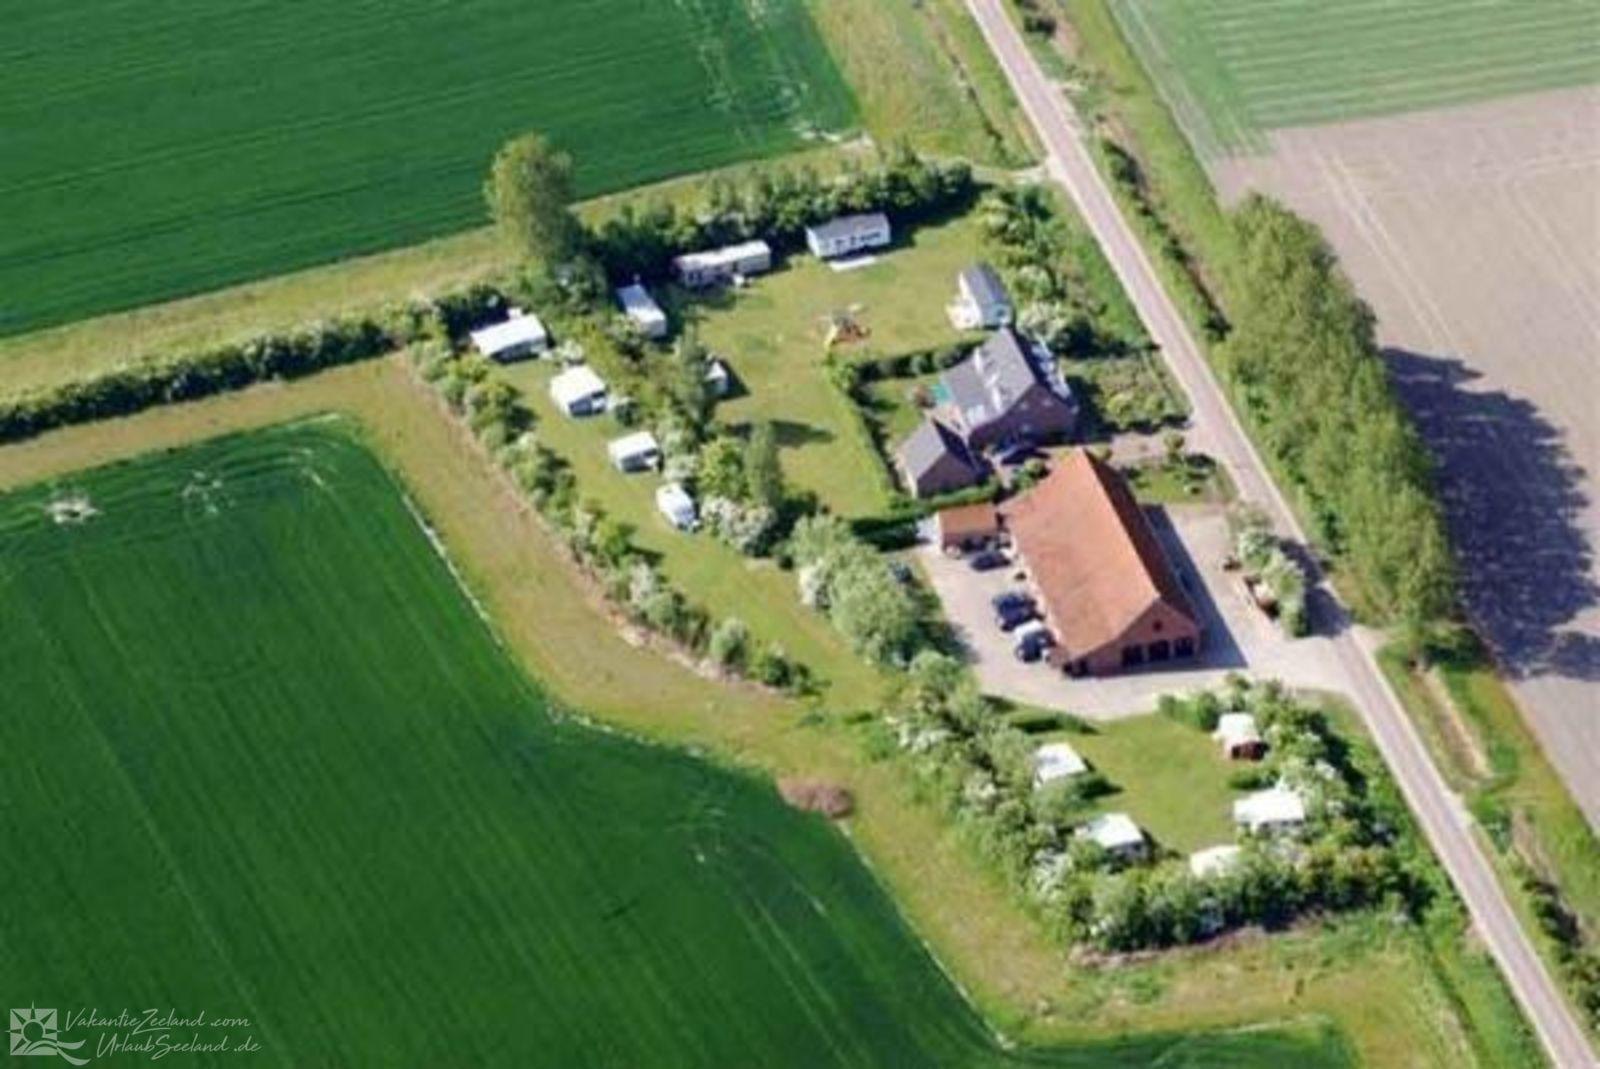 VZ356 Chalet Oostkapelle